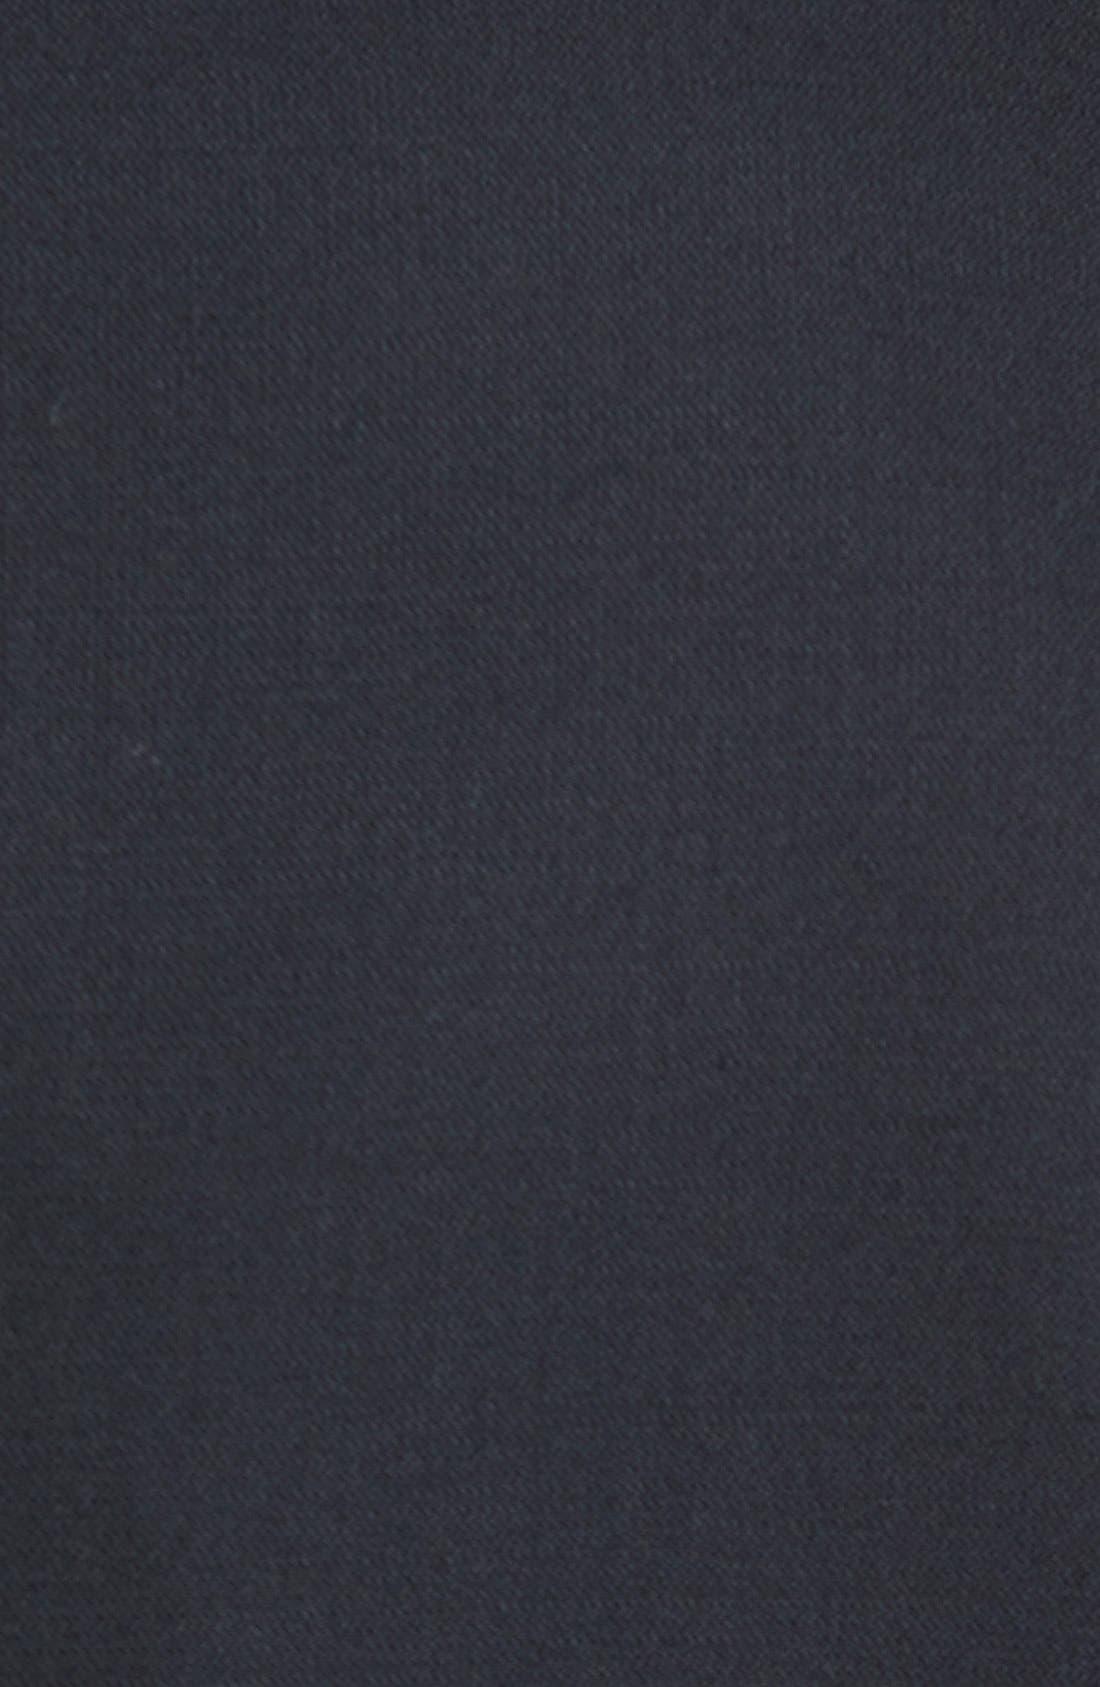 New York Classic Fit Black Wool Tuxedo,                             Alternate thumbnail 7, color,                             BLACK